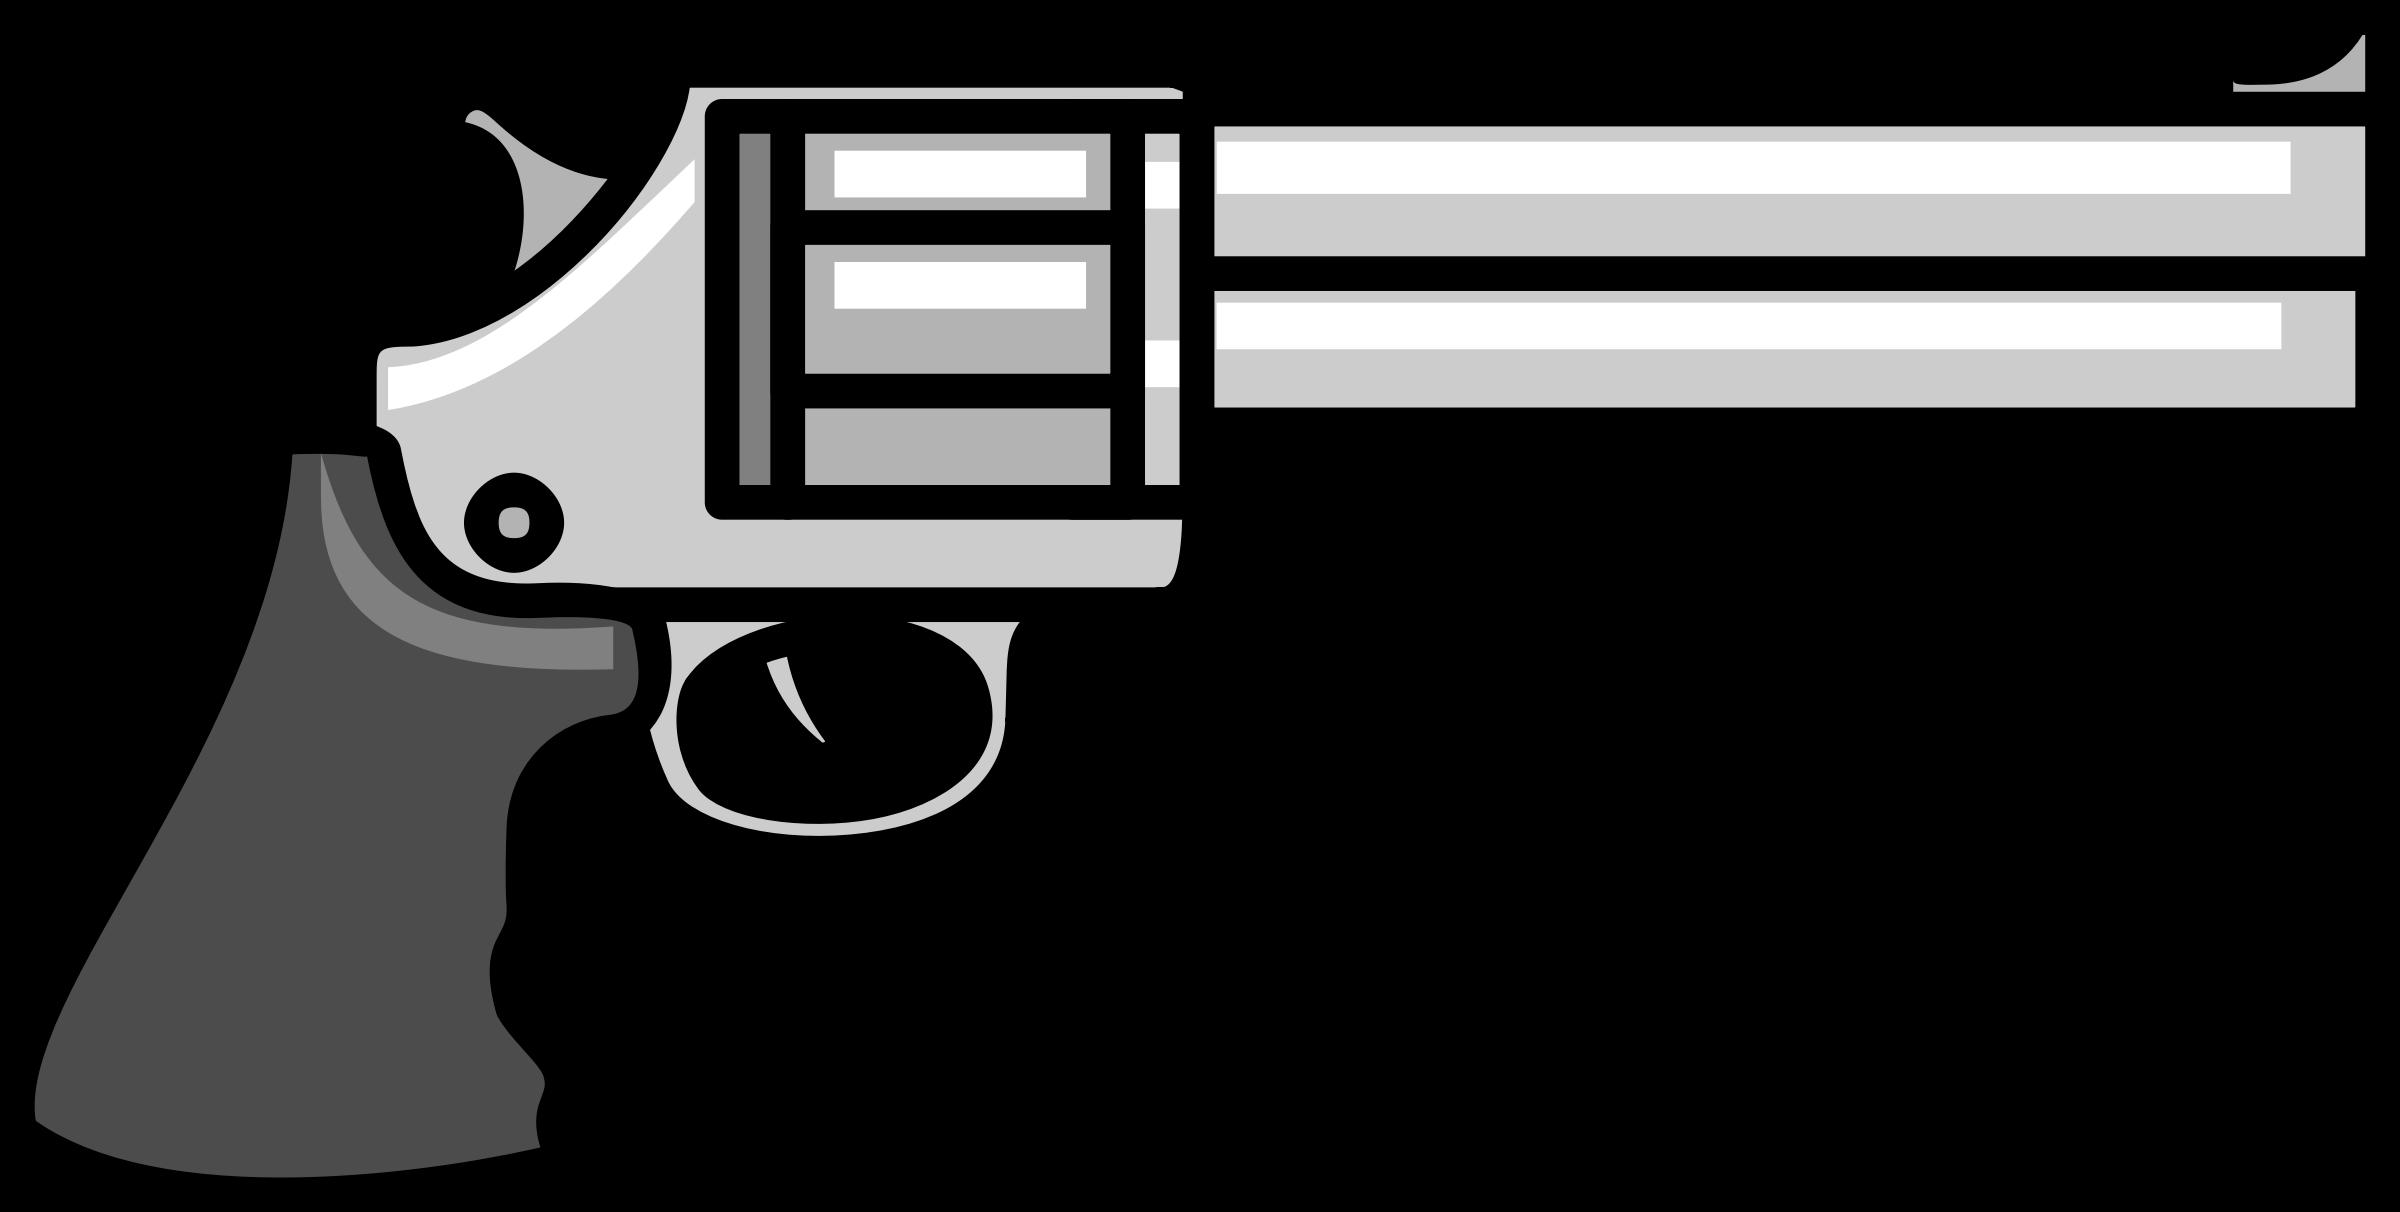 clip transparent stock Gun big image png. Guns clipart black and white